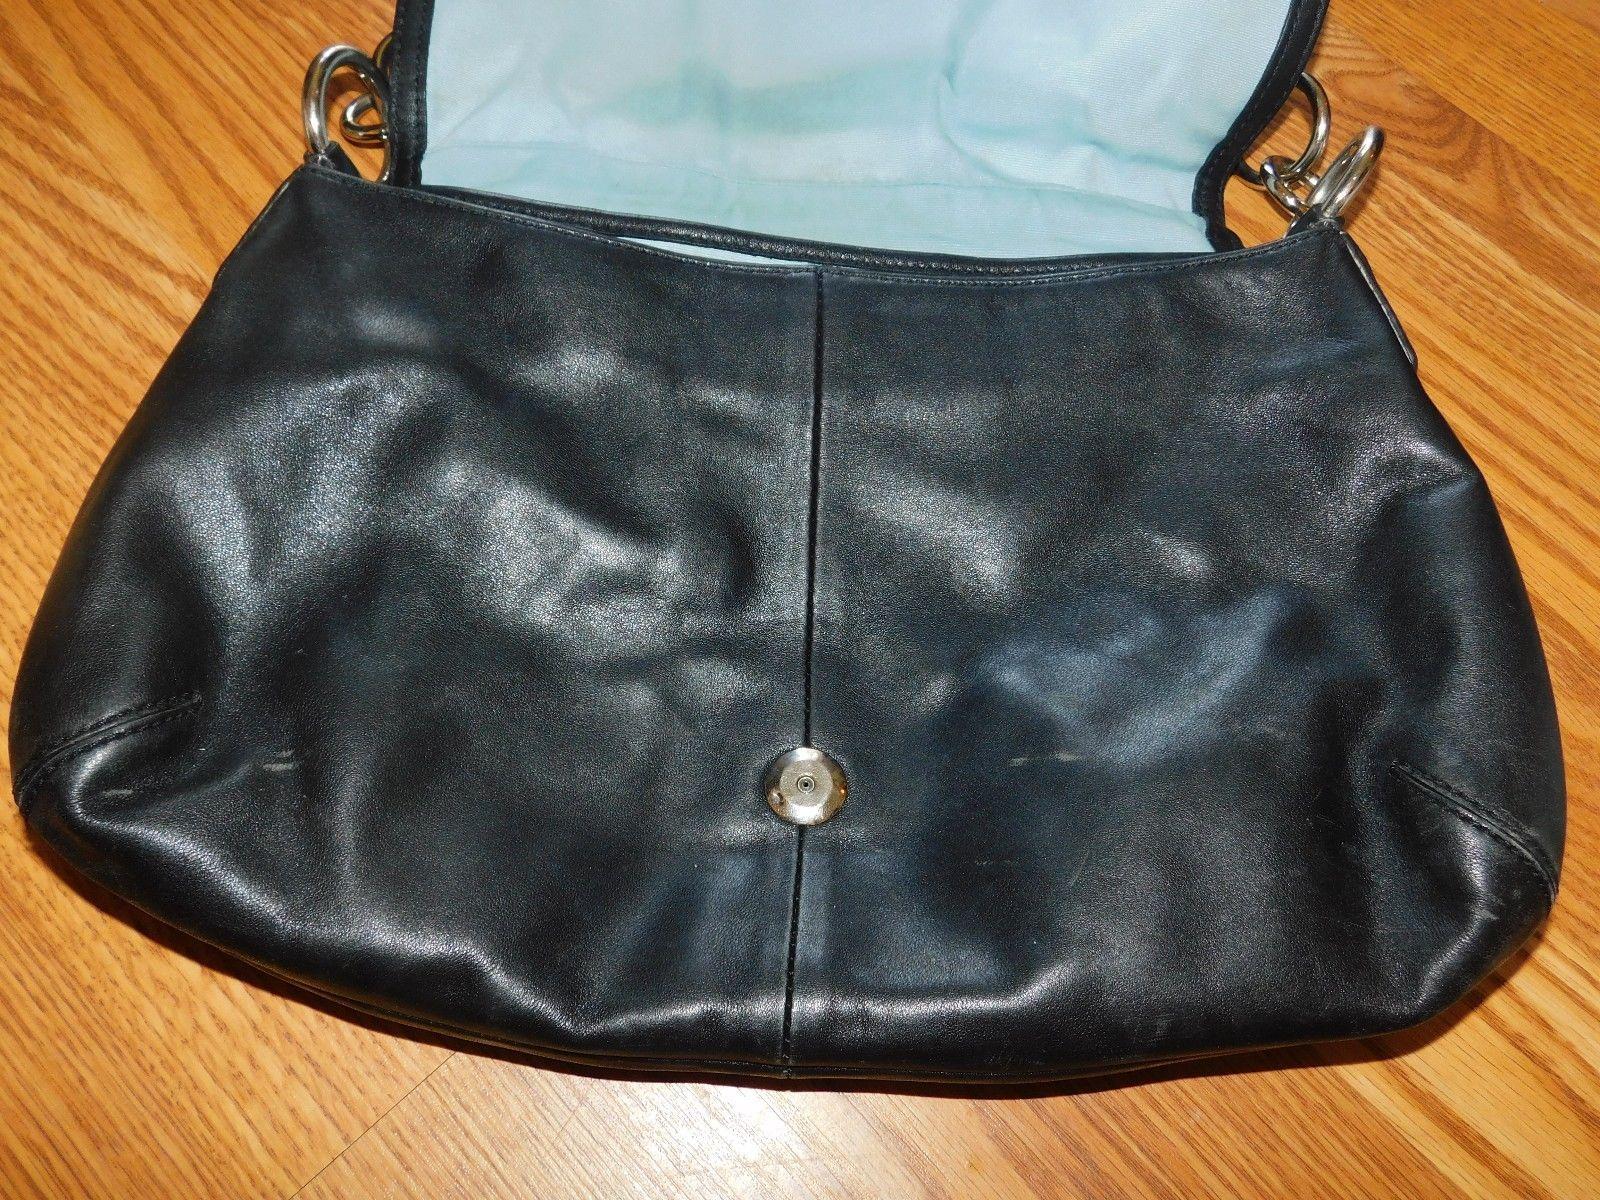 Coach Soho Black Leather Pleated Flap Bag 17217